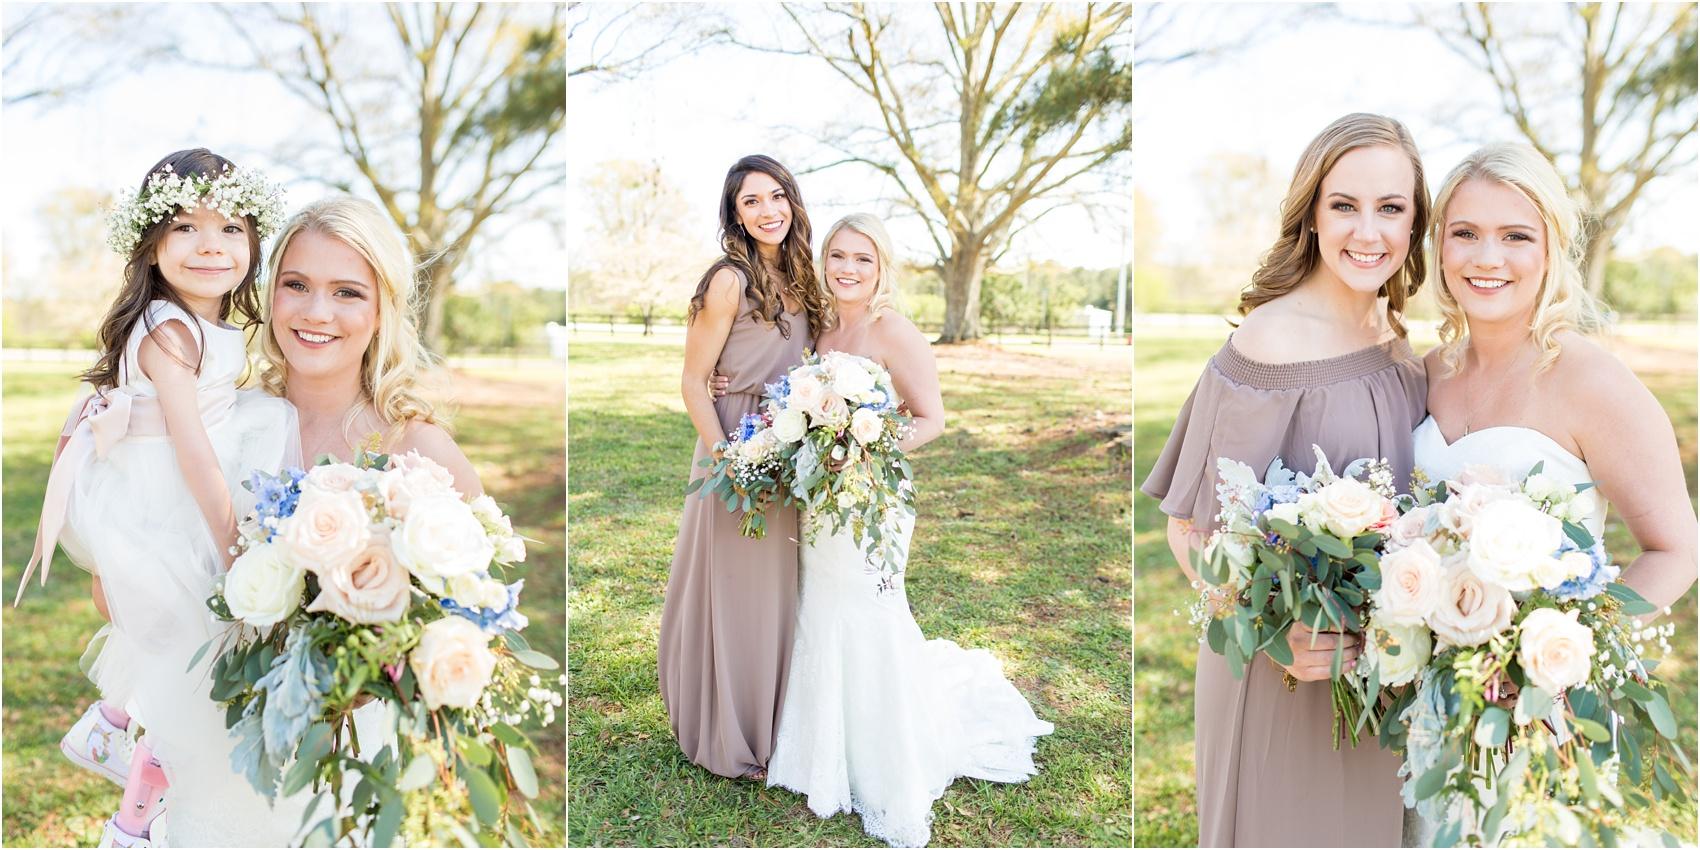 Savannah Eve Photography- Wade Wedding-33.jpg